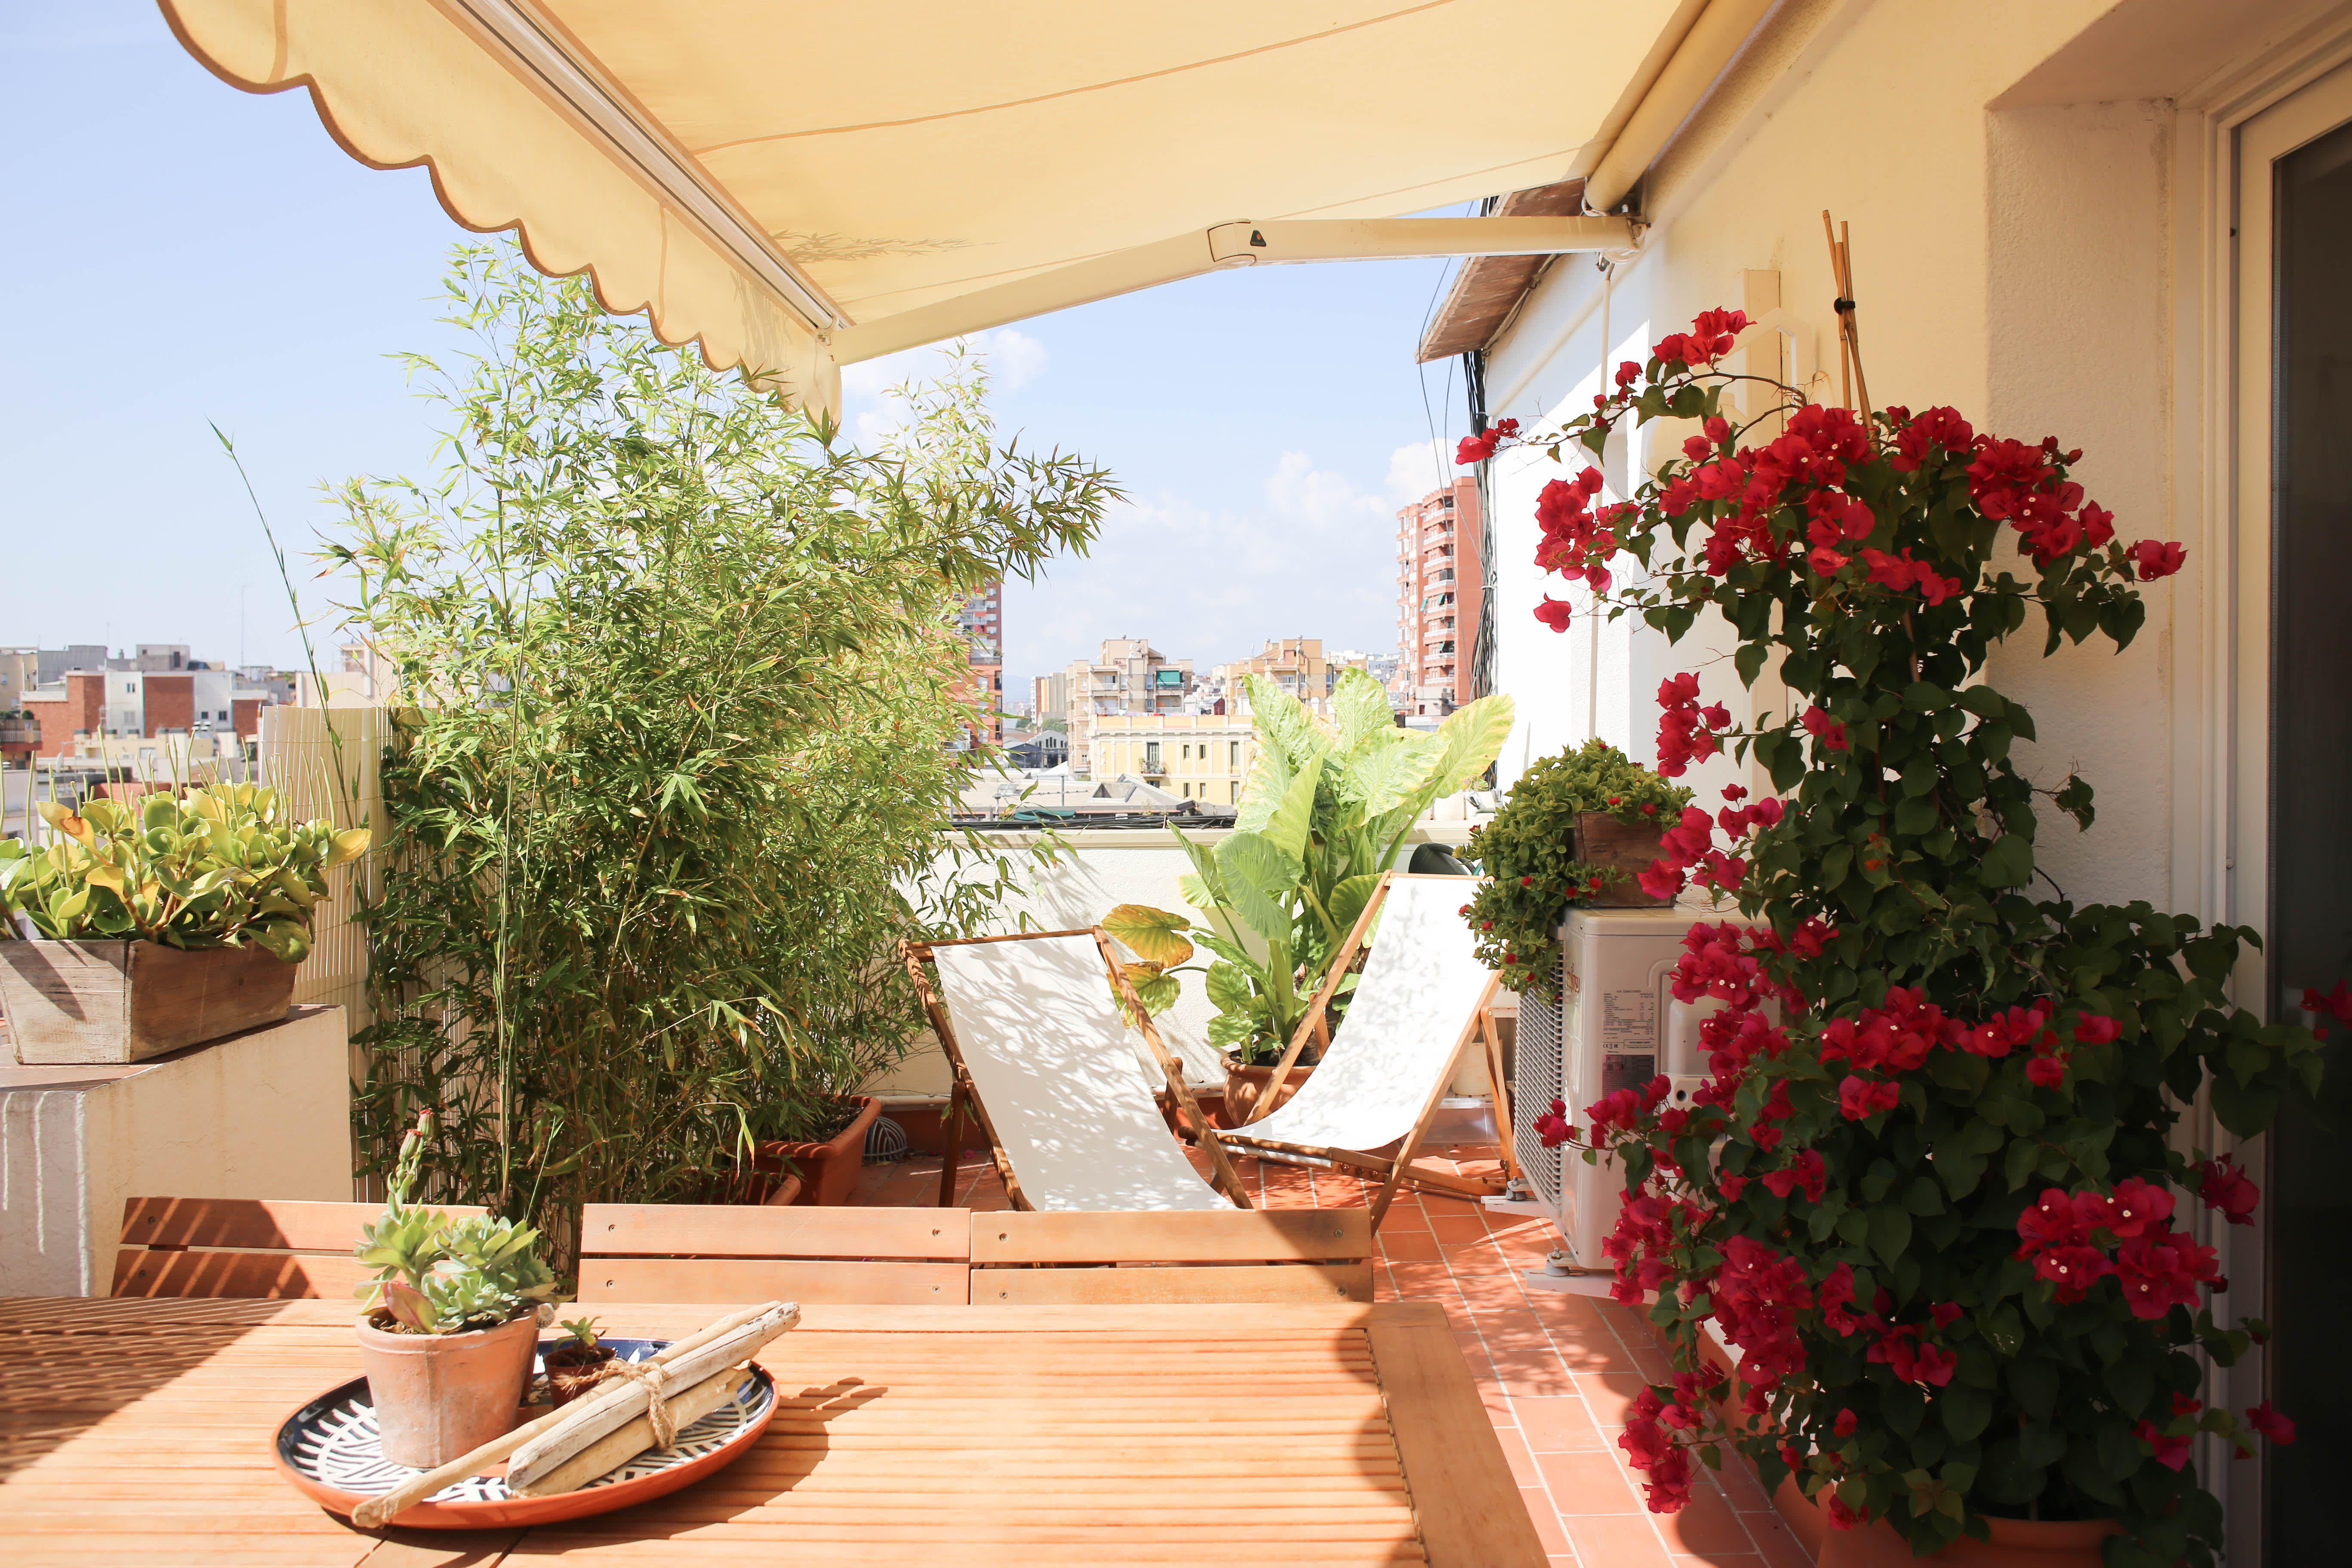 Organic Minimal Meets The Mediterranean Way Of Life In Barcelona